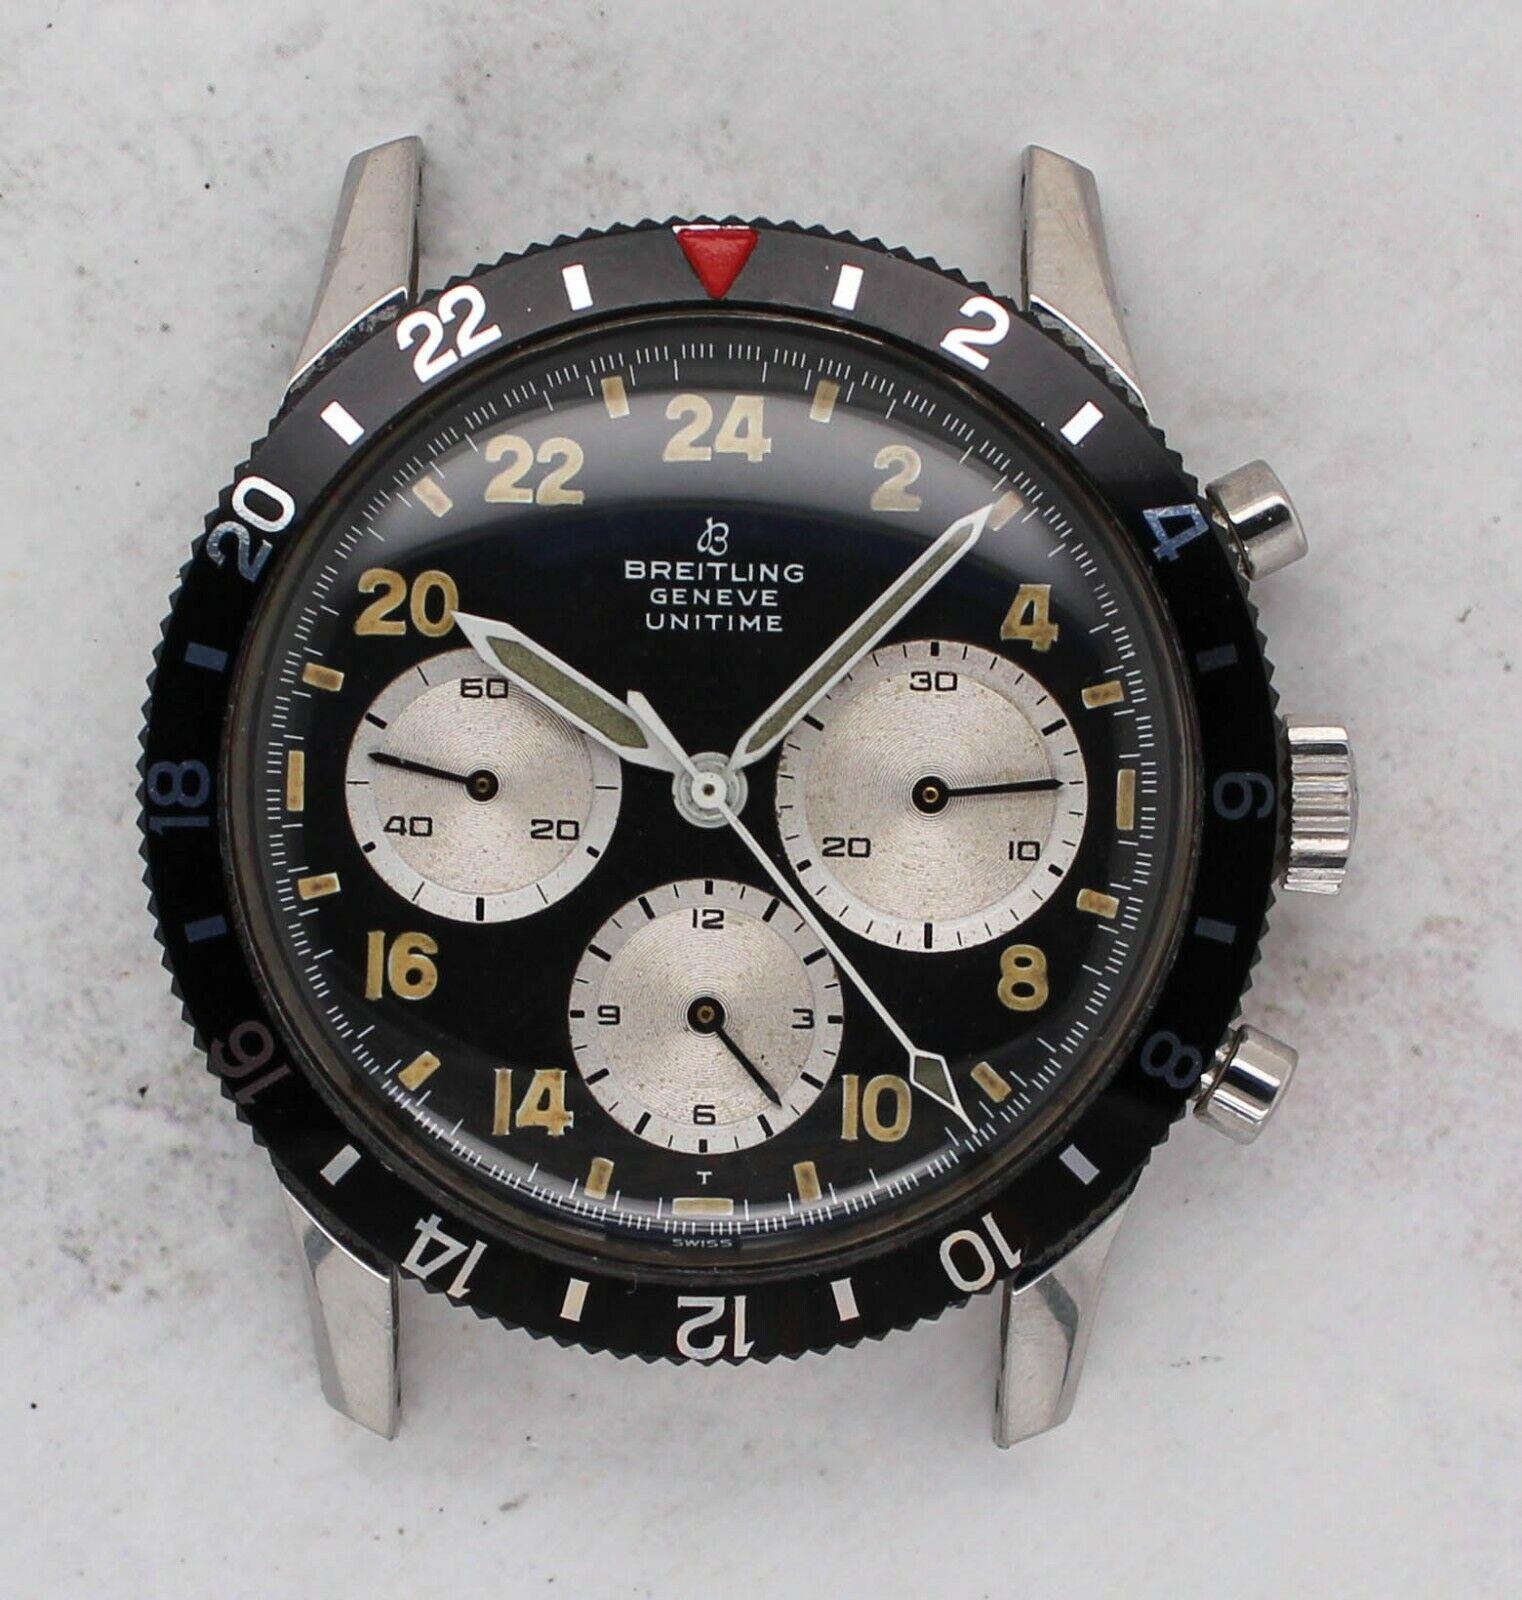 Vintage Breitling Unitime Chronograph Wristwatch Ref. 1765 Venus 178 Rare 40mm - watch picture 1